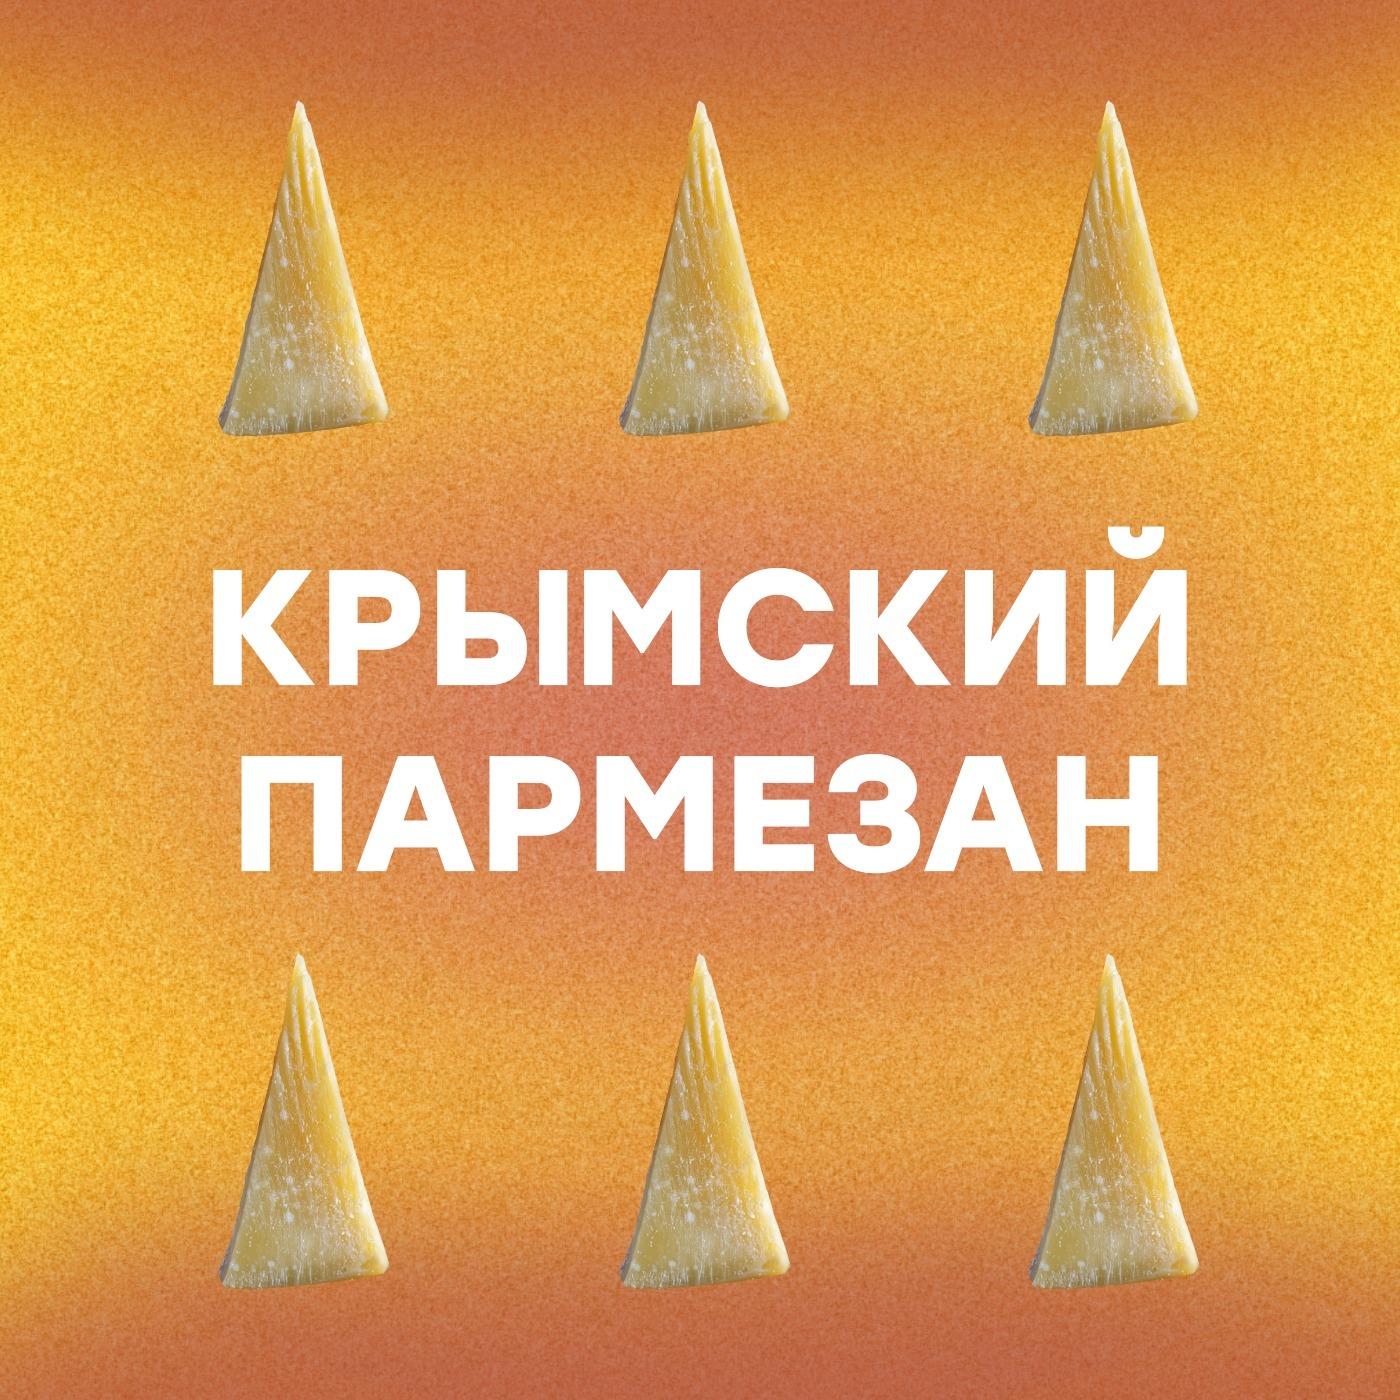 Путин «прикарманил» Крым | Крымский.Пармезан